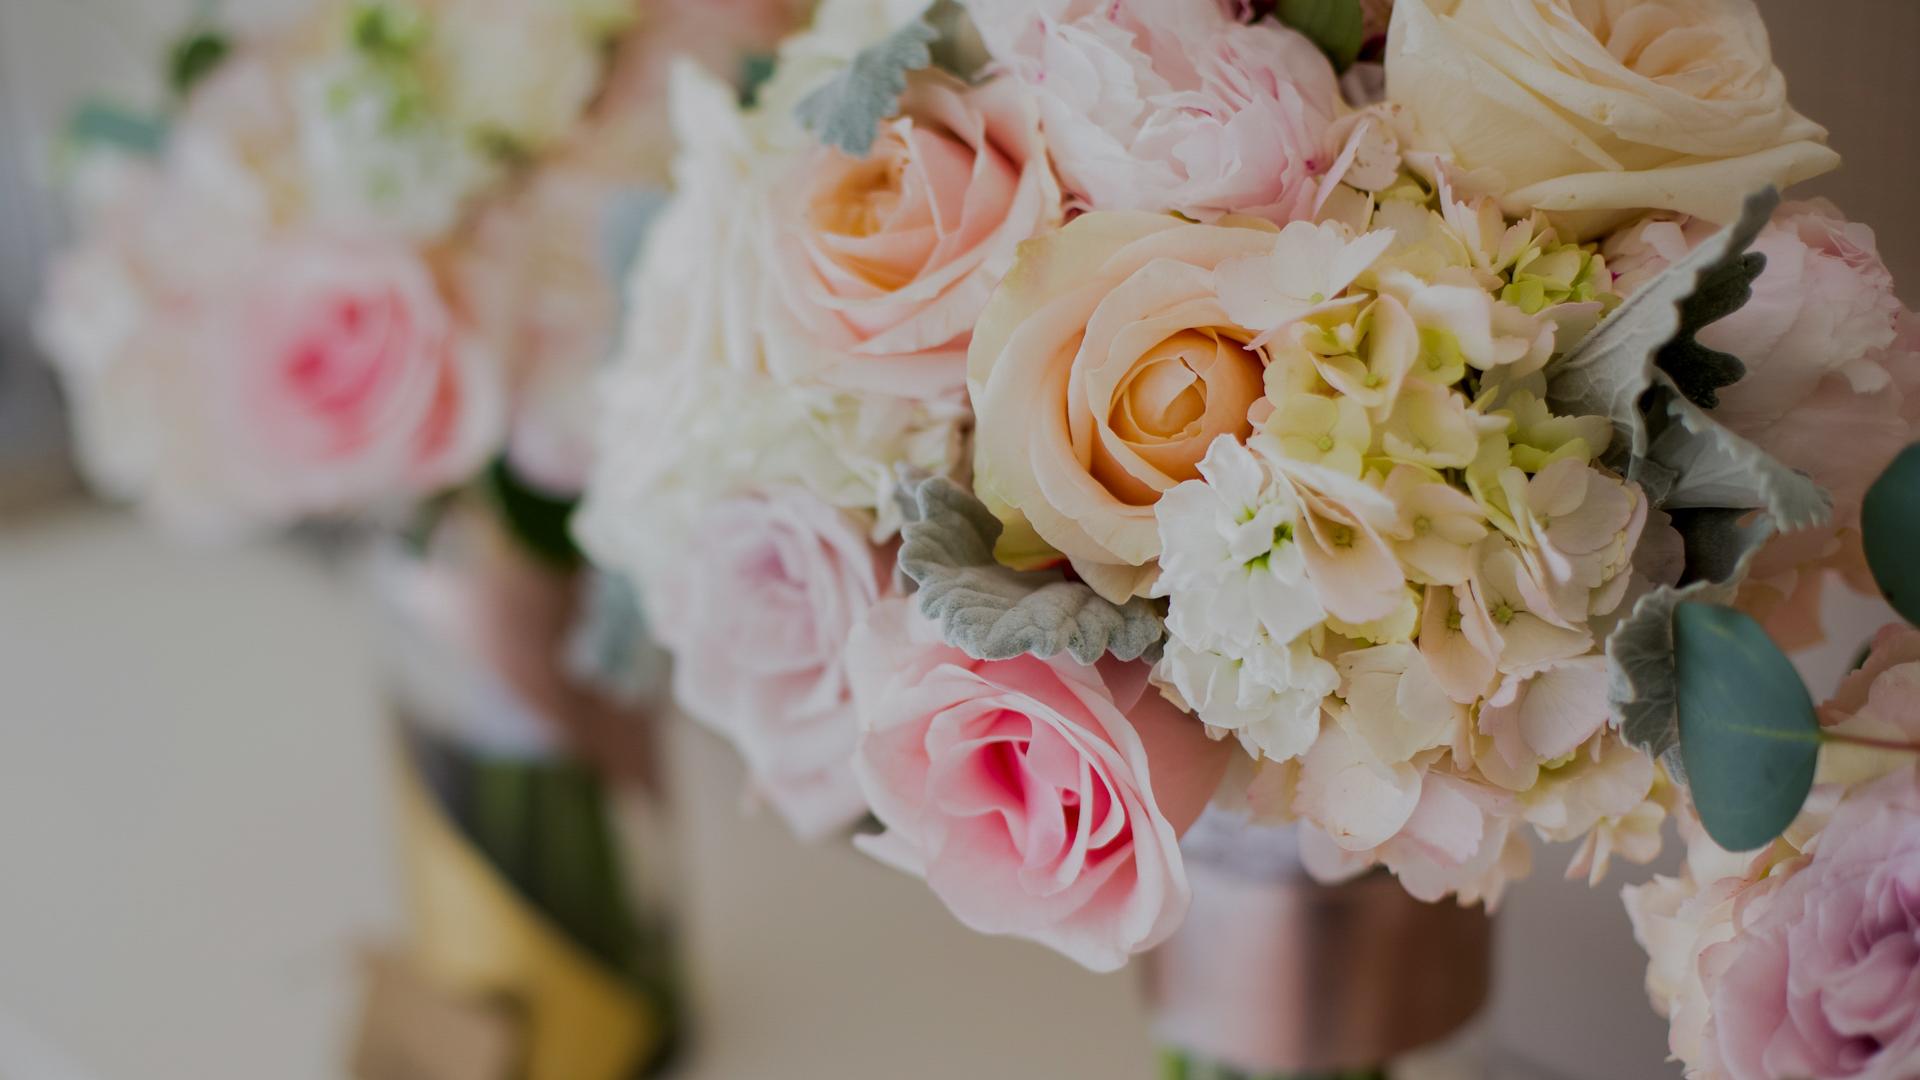 Hyland Hills Chalet WEDDING PHOTOS